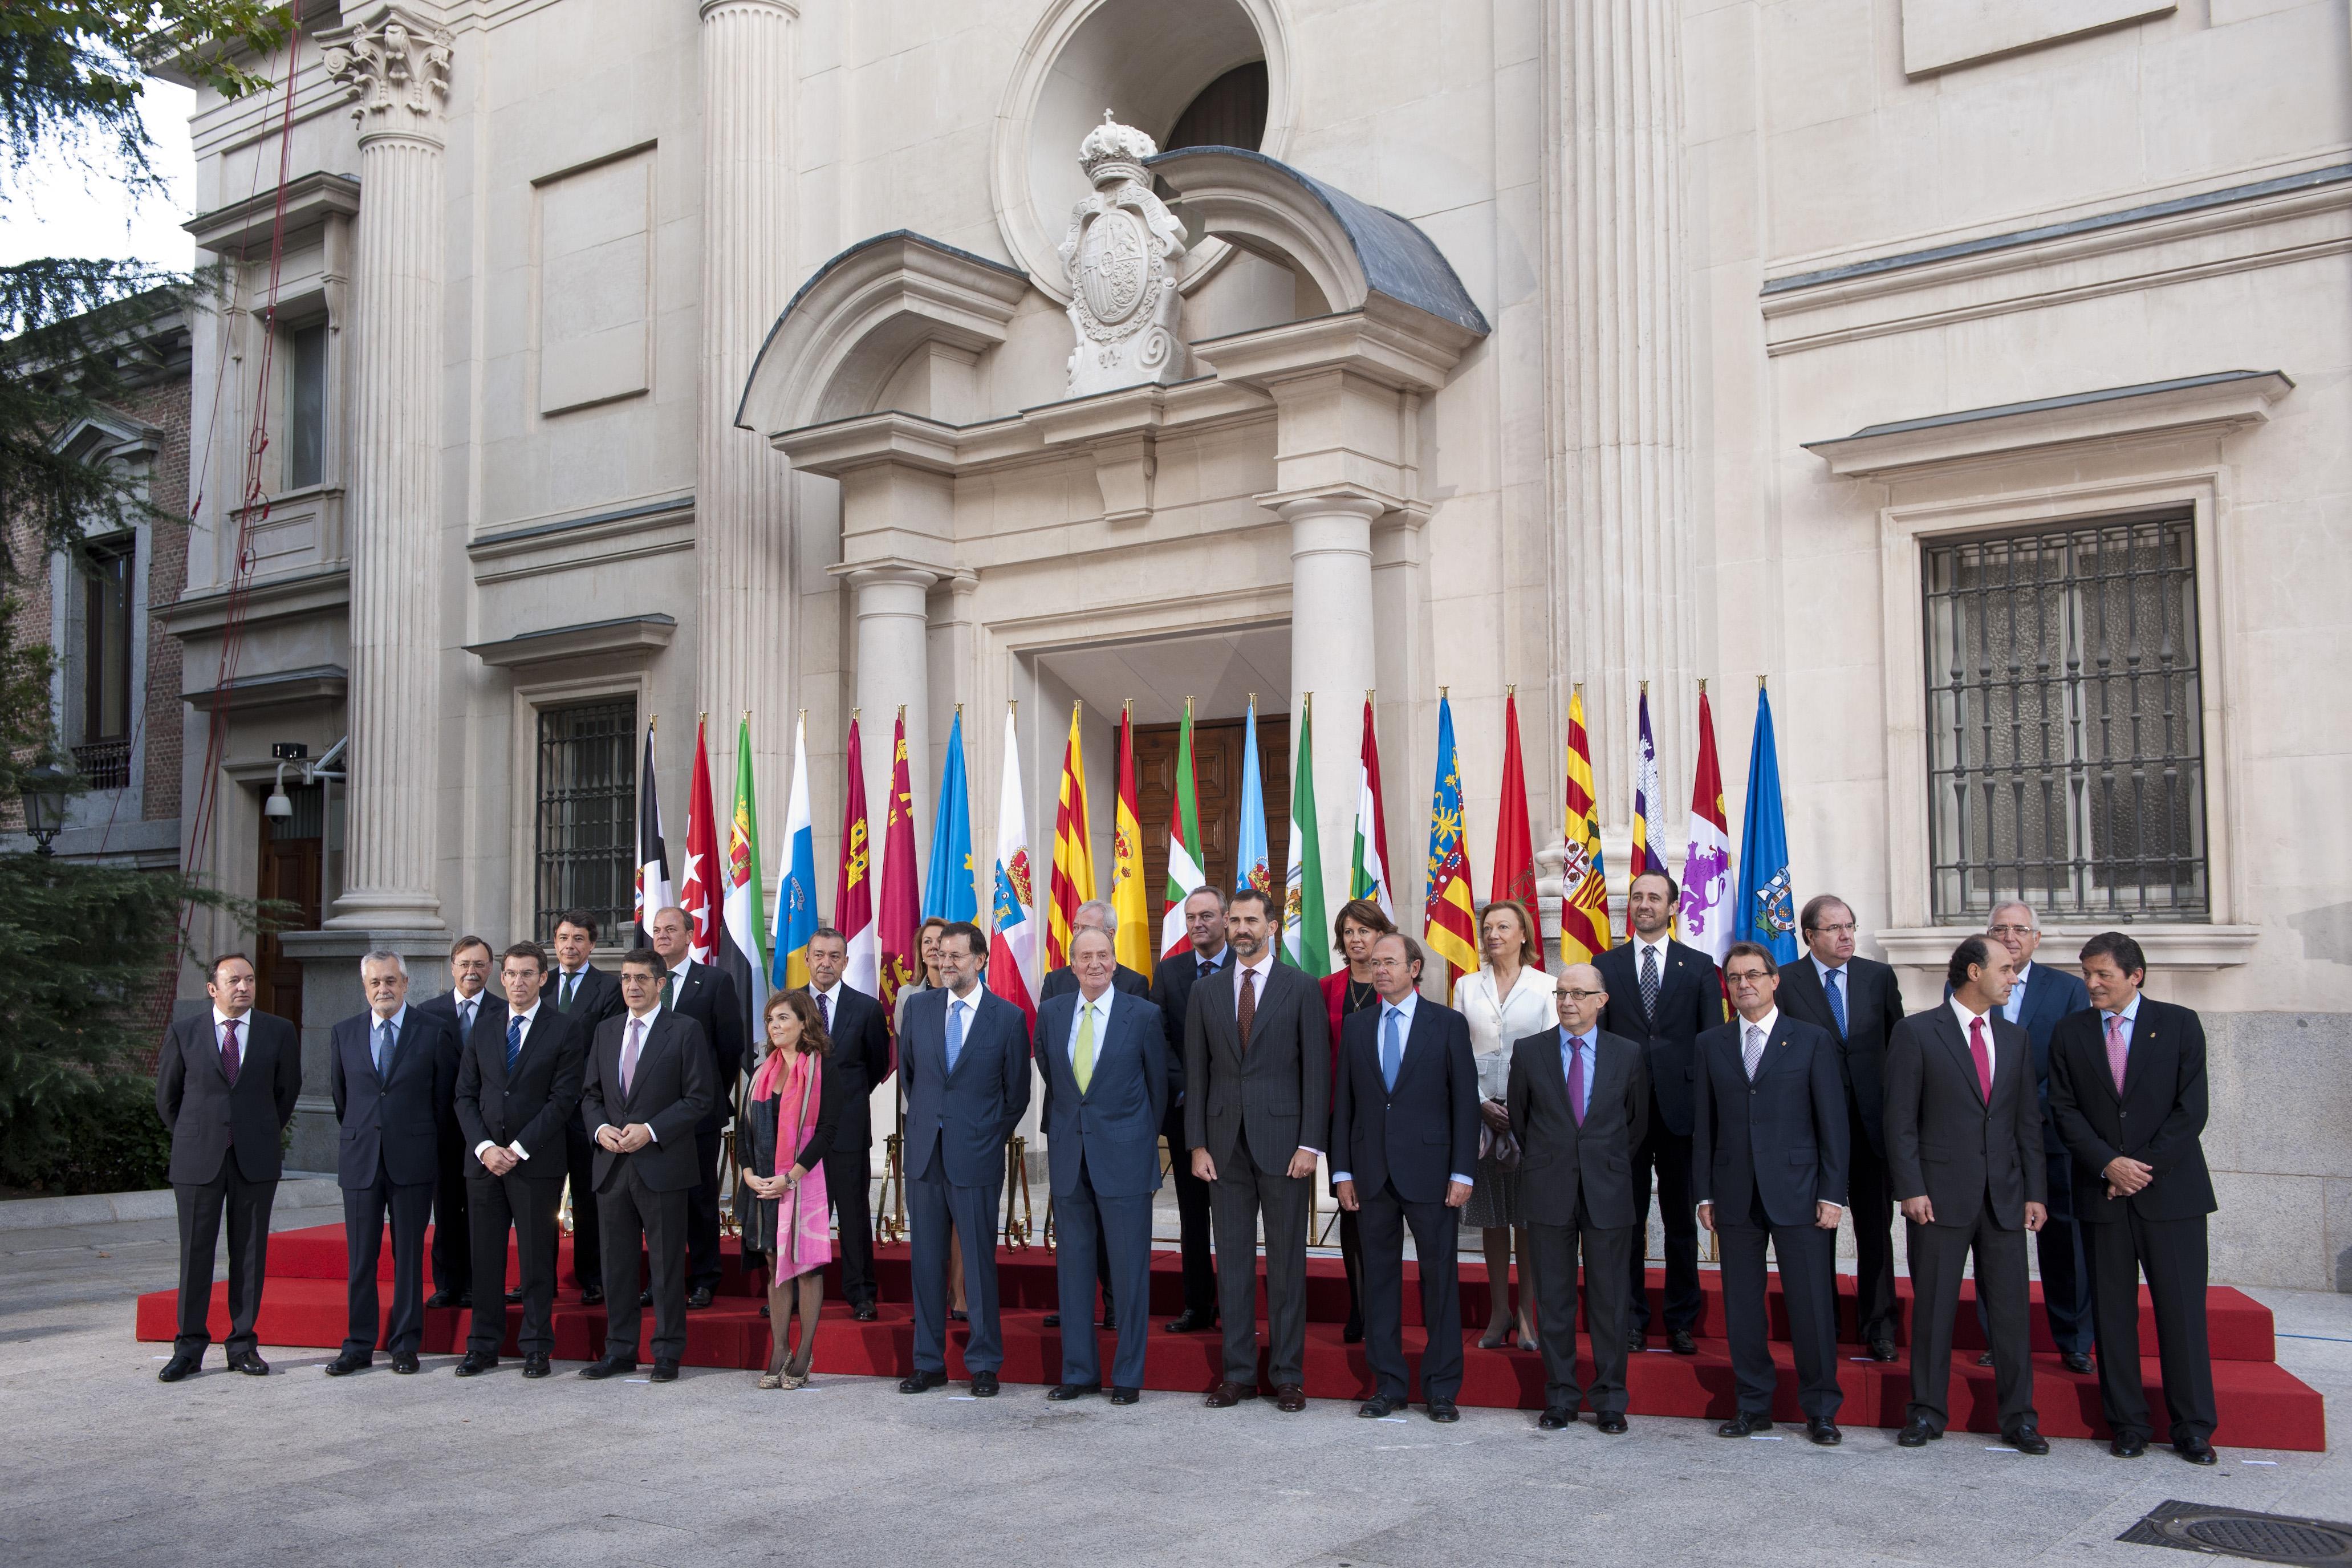 2012_10_02_confe_presidentes_085.jpg